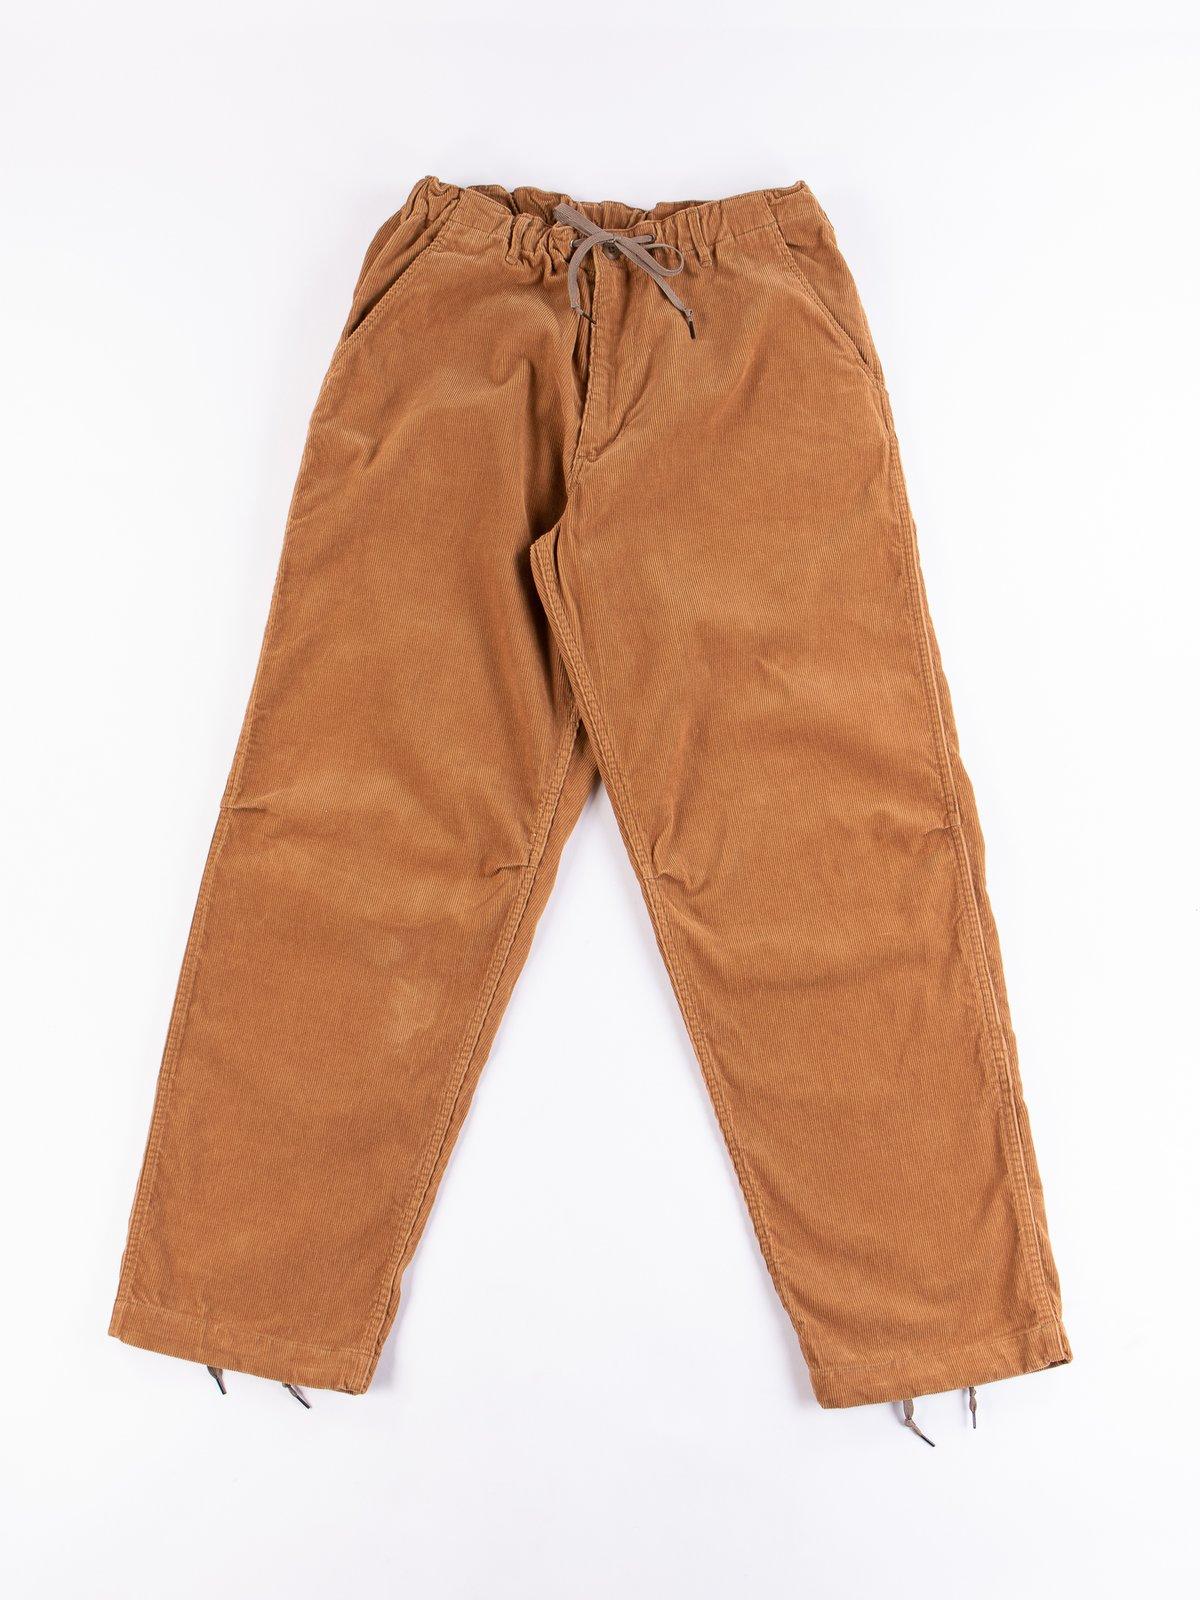 Brown Cord TBB Service Pant - Image 1